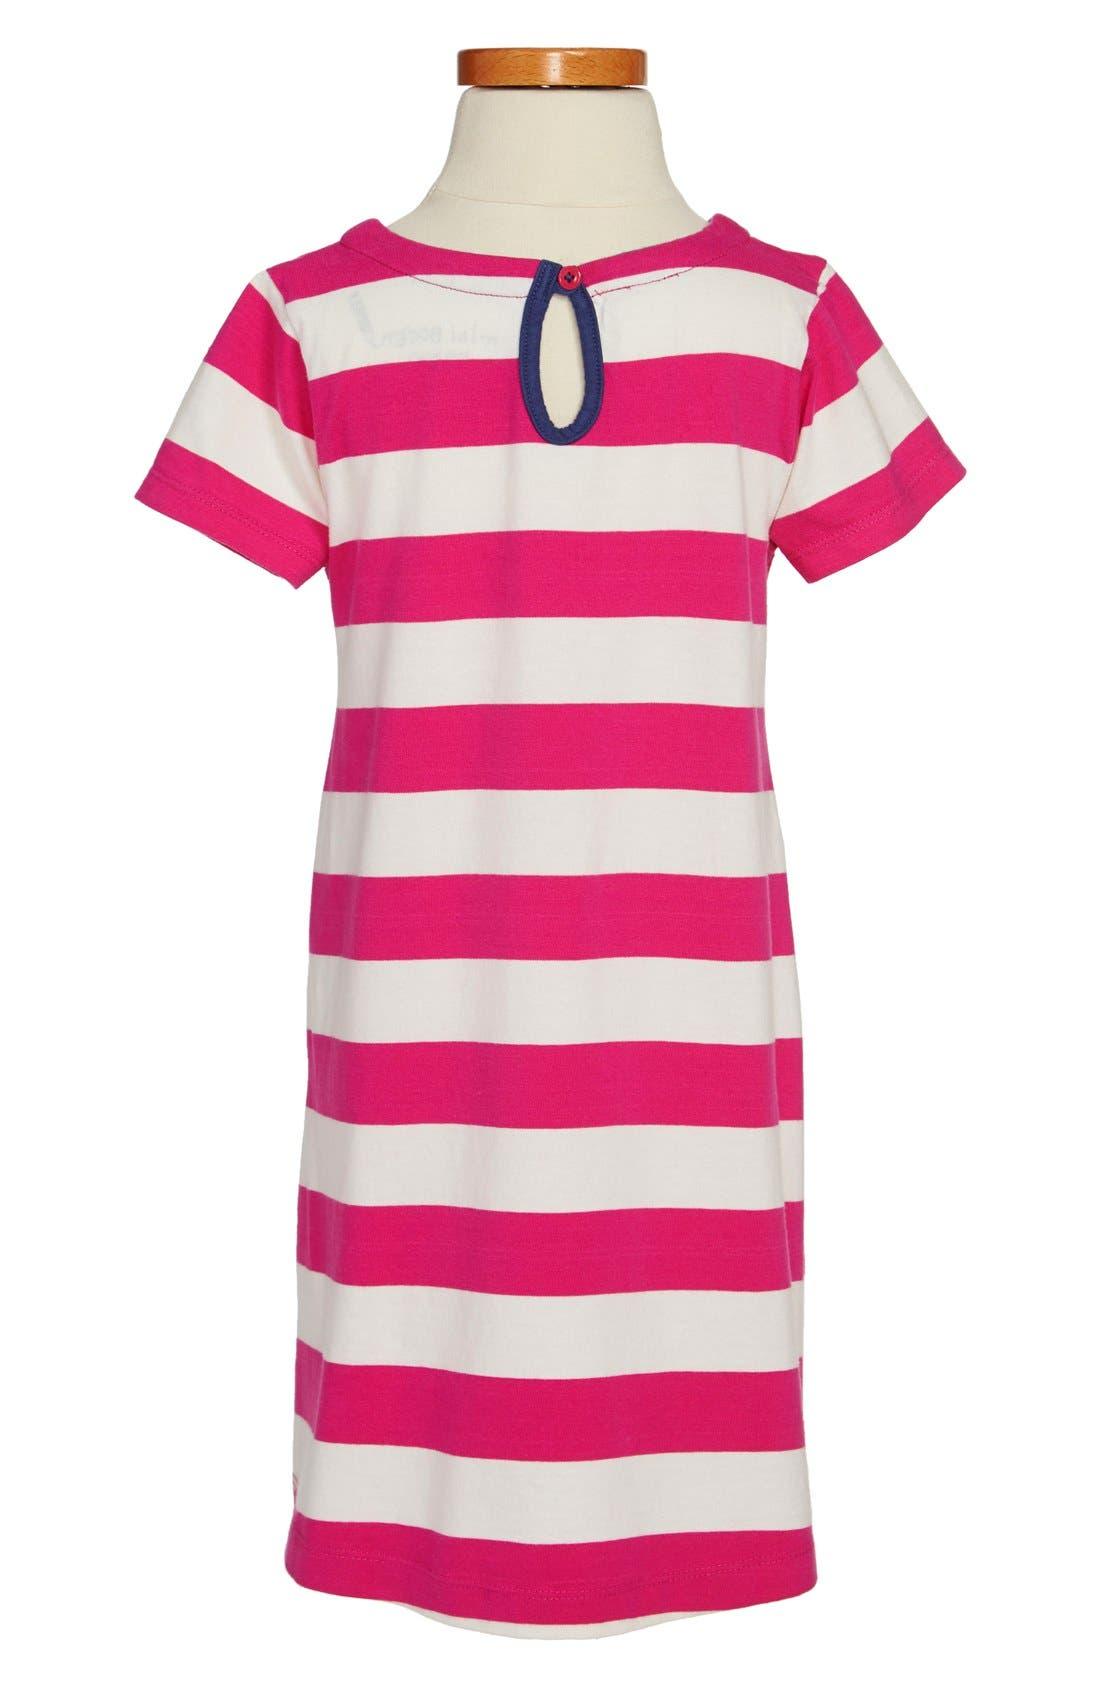 Alternate Image 2  - Mini Boden Appliqué Cotton Dress (Toddler Girls, Little Girls & Big Girls)